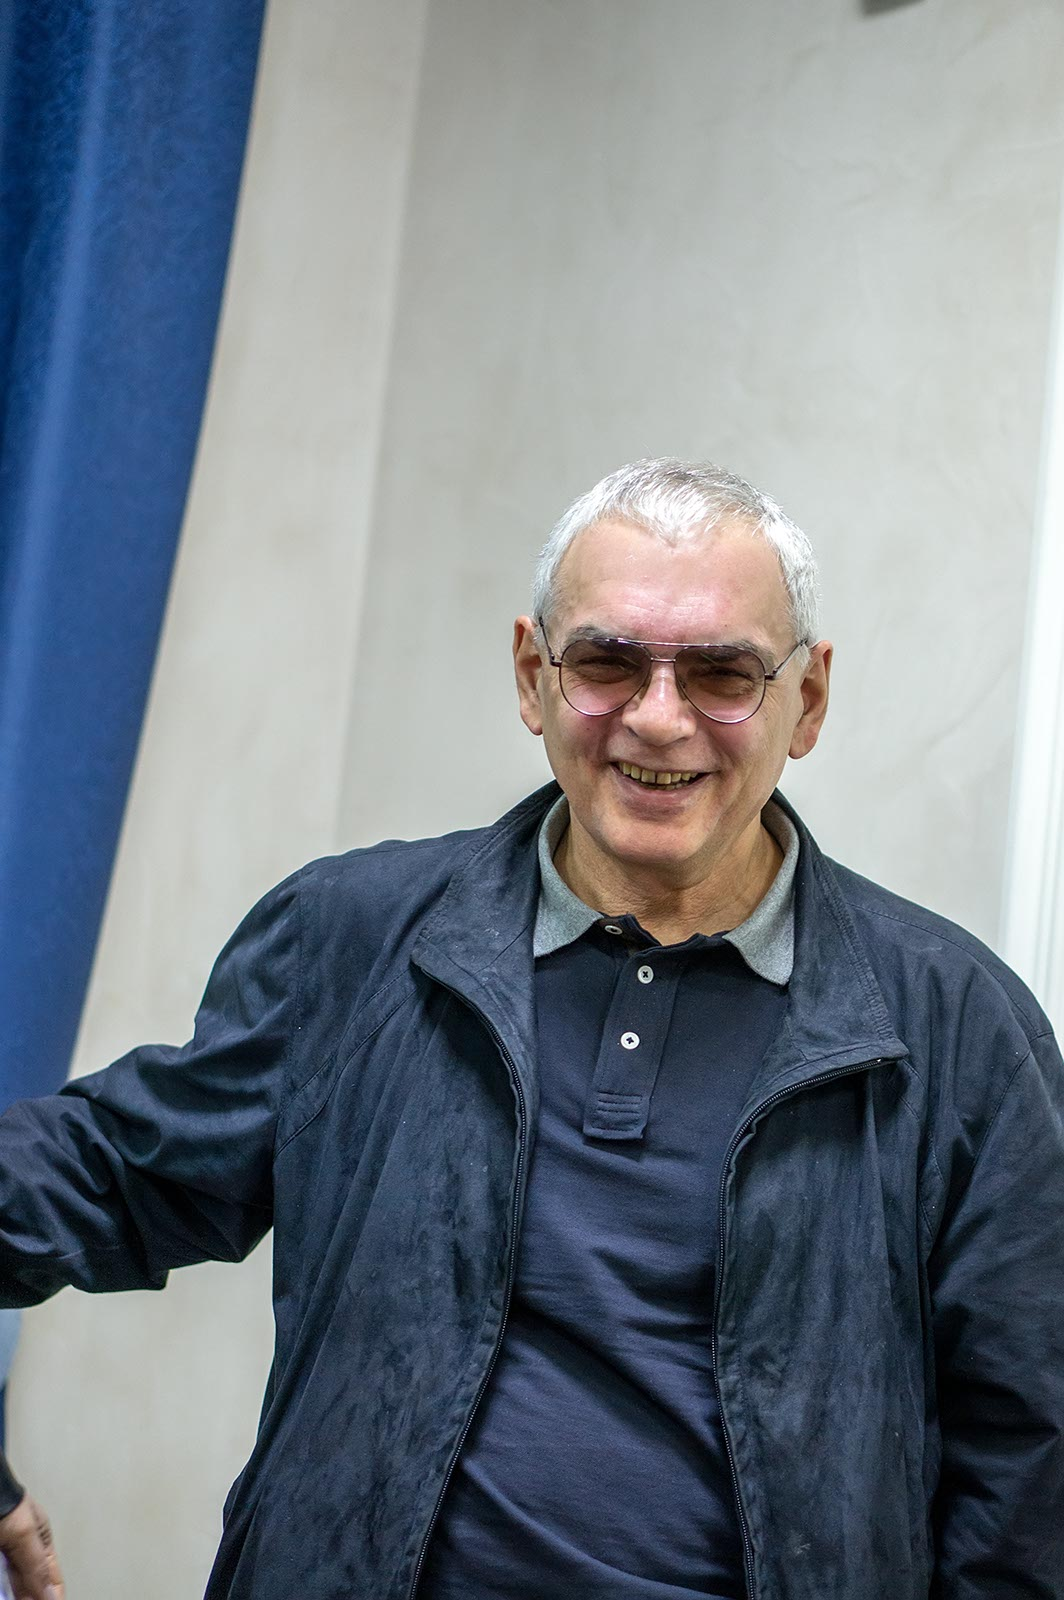 Фото №141606. Карен Георгиевич Шахназаров